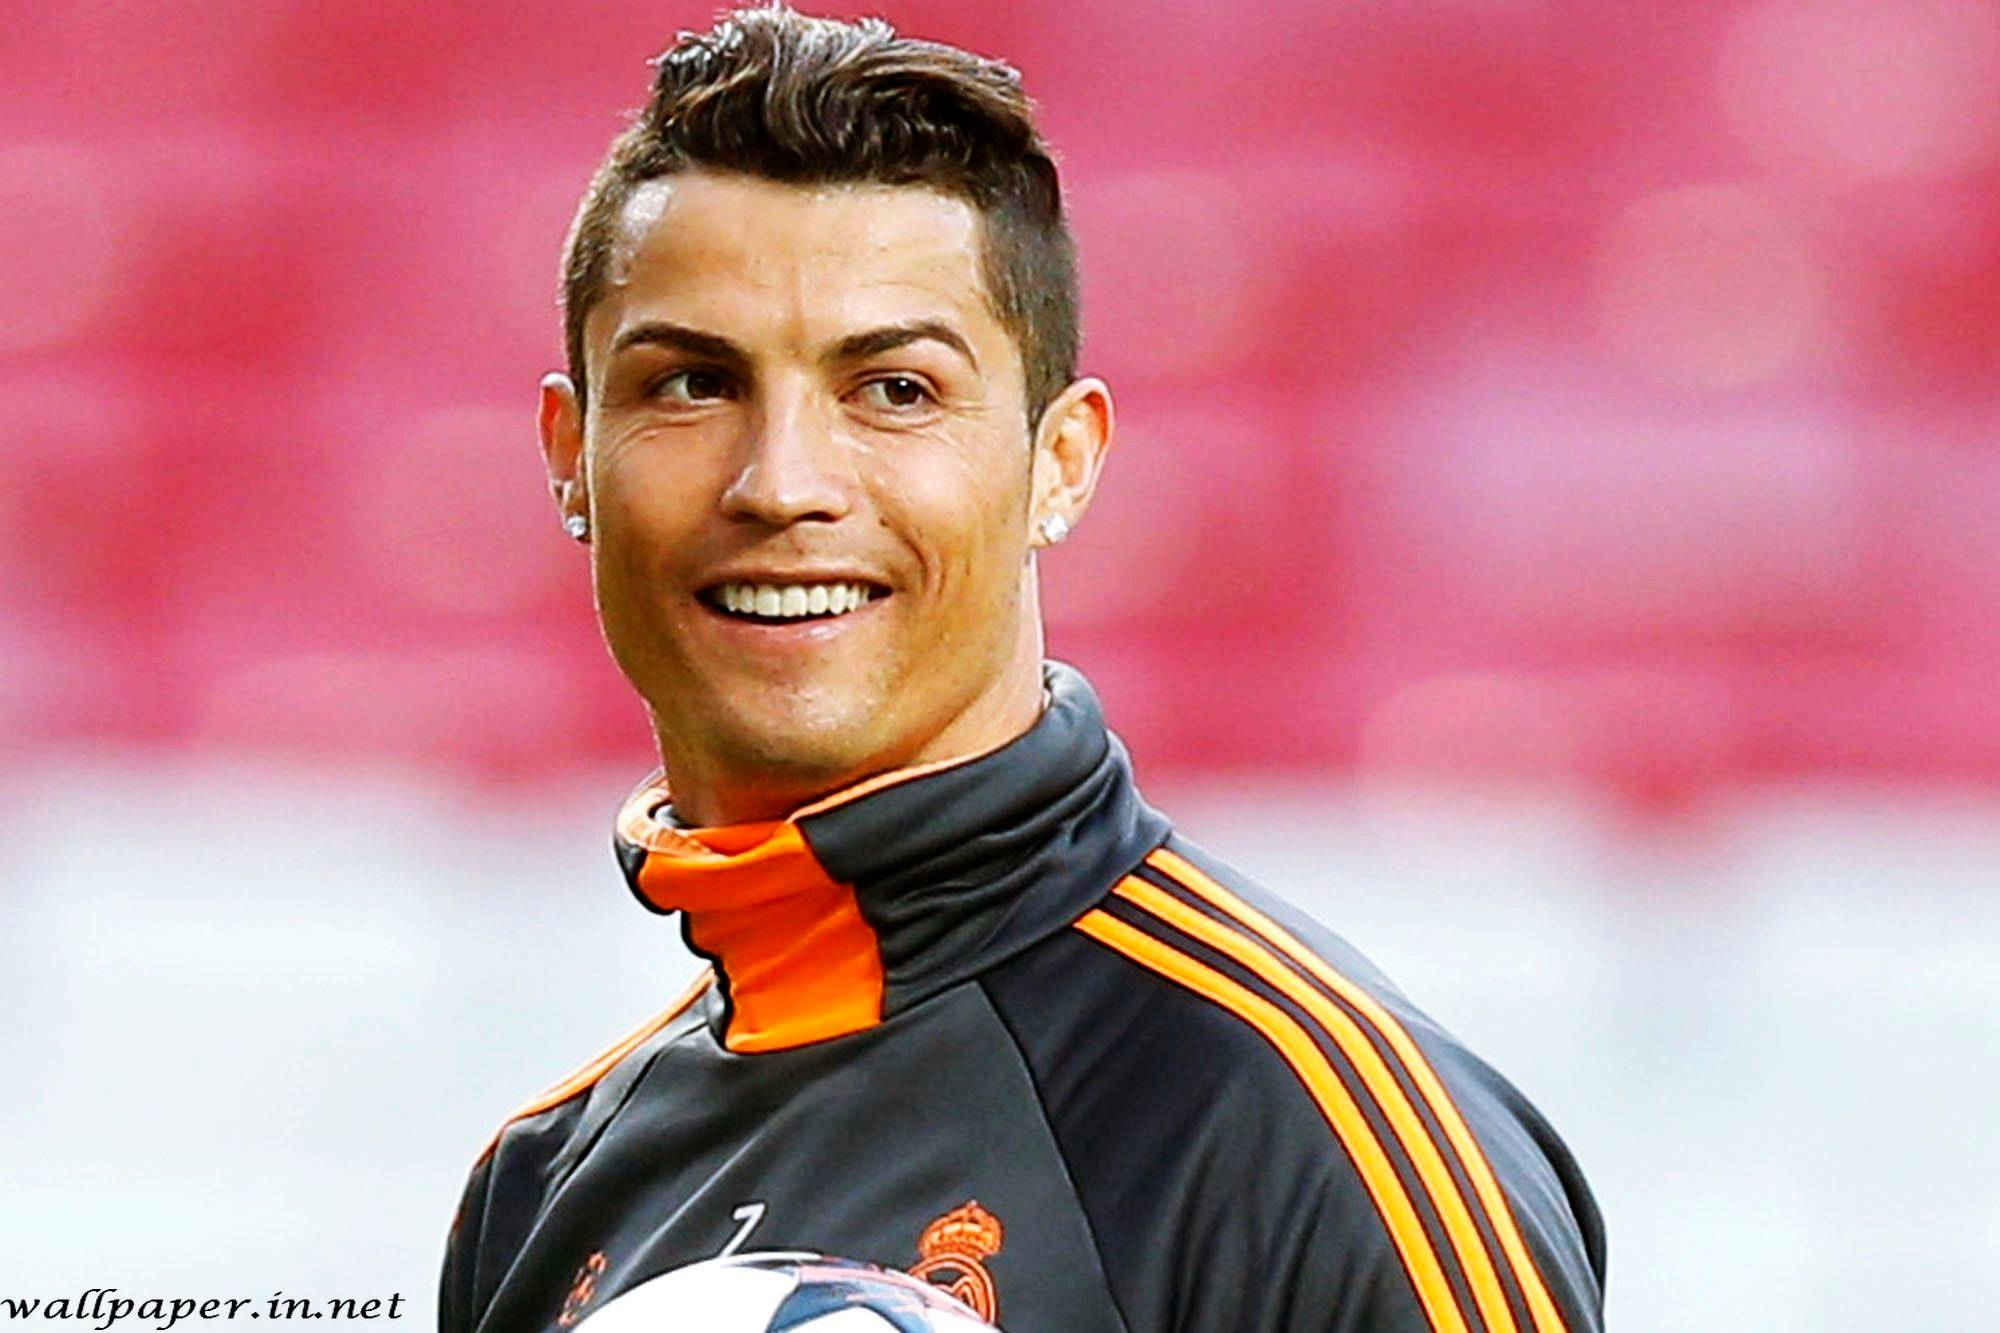 Cristiano-Ronaldo-HD-Wallpapers-Fifa-World-Cup-2014.jpg